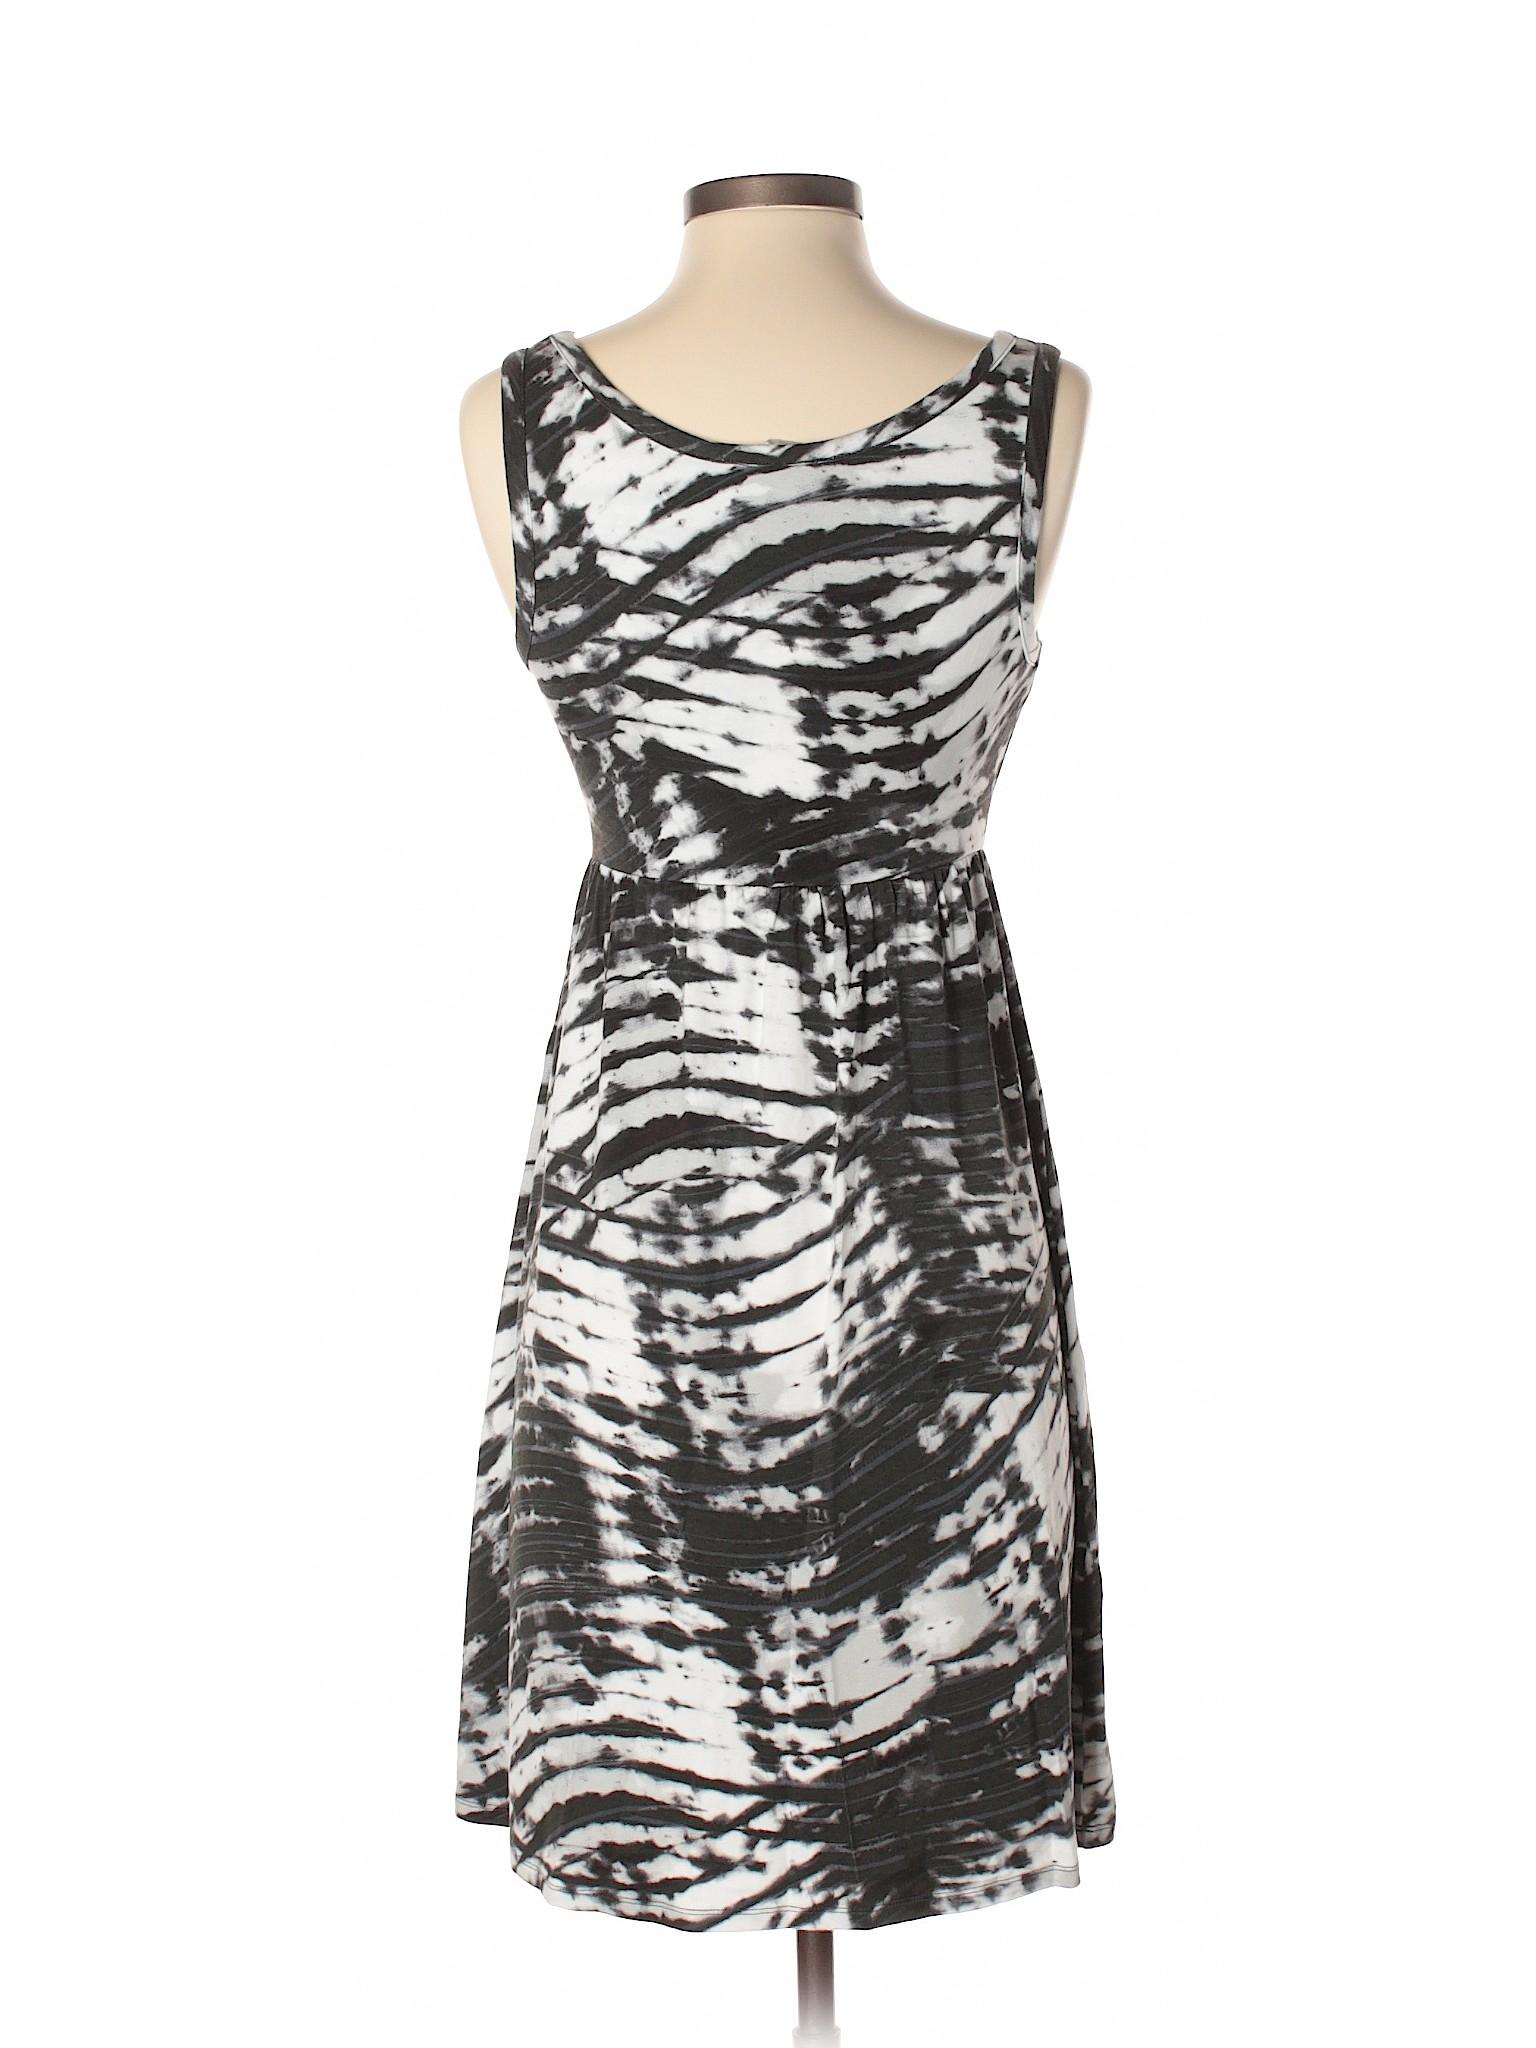 Dress Selling Kenar Selling Casual Selling Kenar Dress Casual Kenar Casual Dress rBAvr